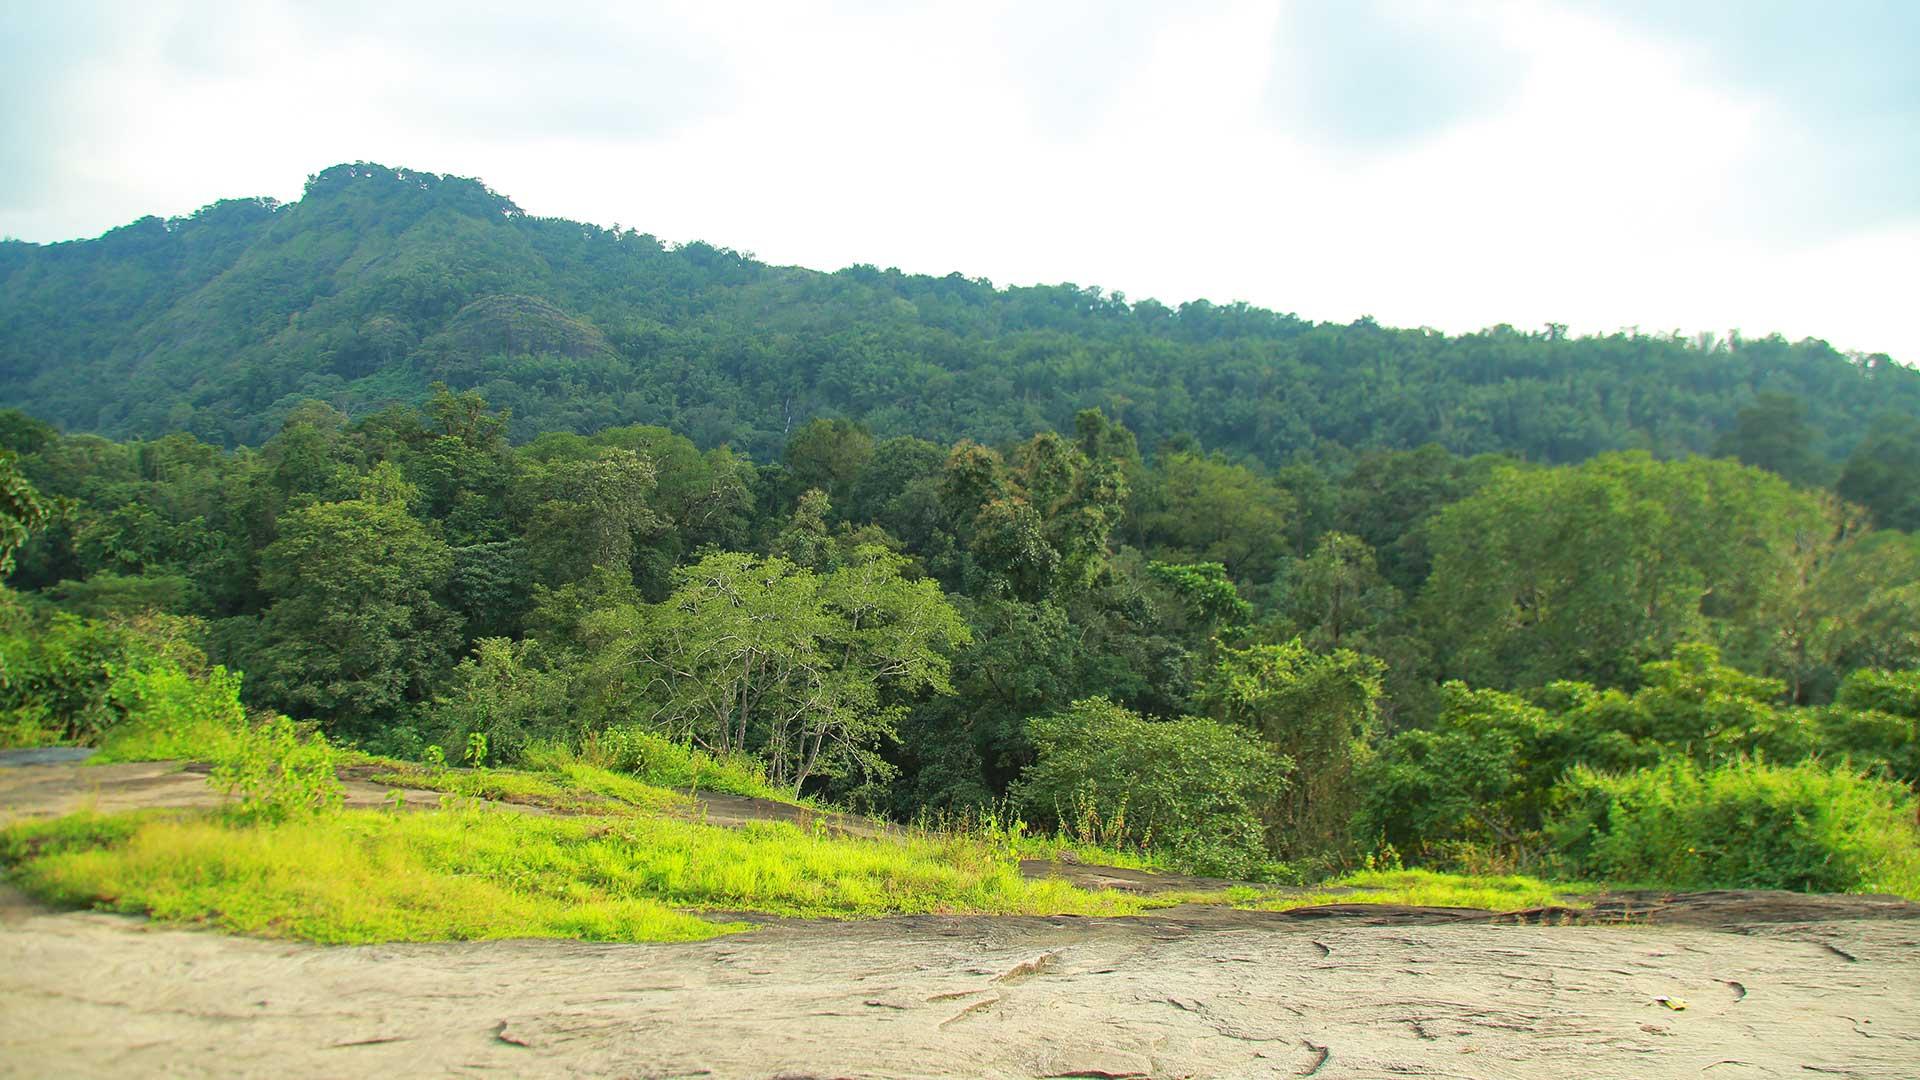 View-of-Western-Ghats-from-aali-veena-kuthu-hills, Aali Veena Kuth